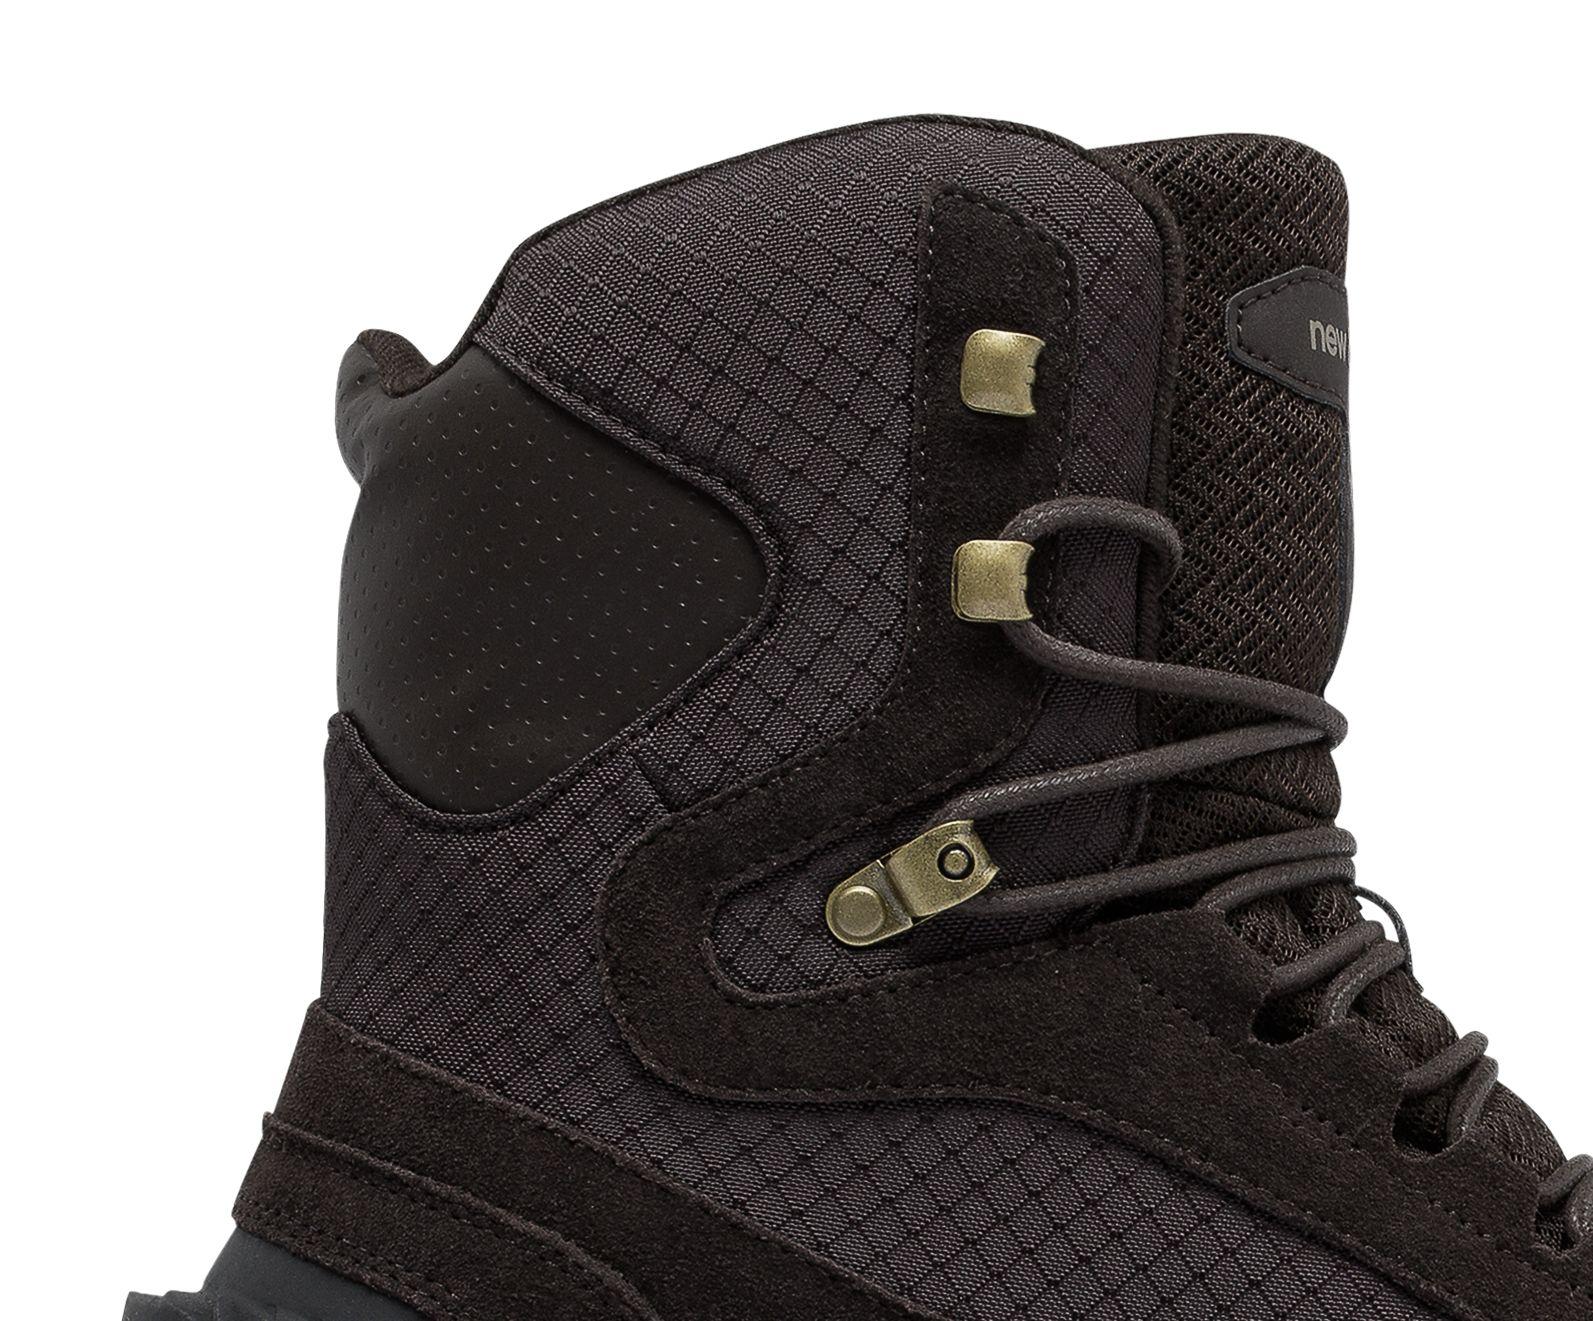 New Balance : Fresh Foam 1000 Boot : Men's Hiking & Walking : BM1000BR